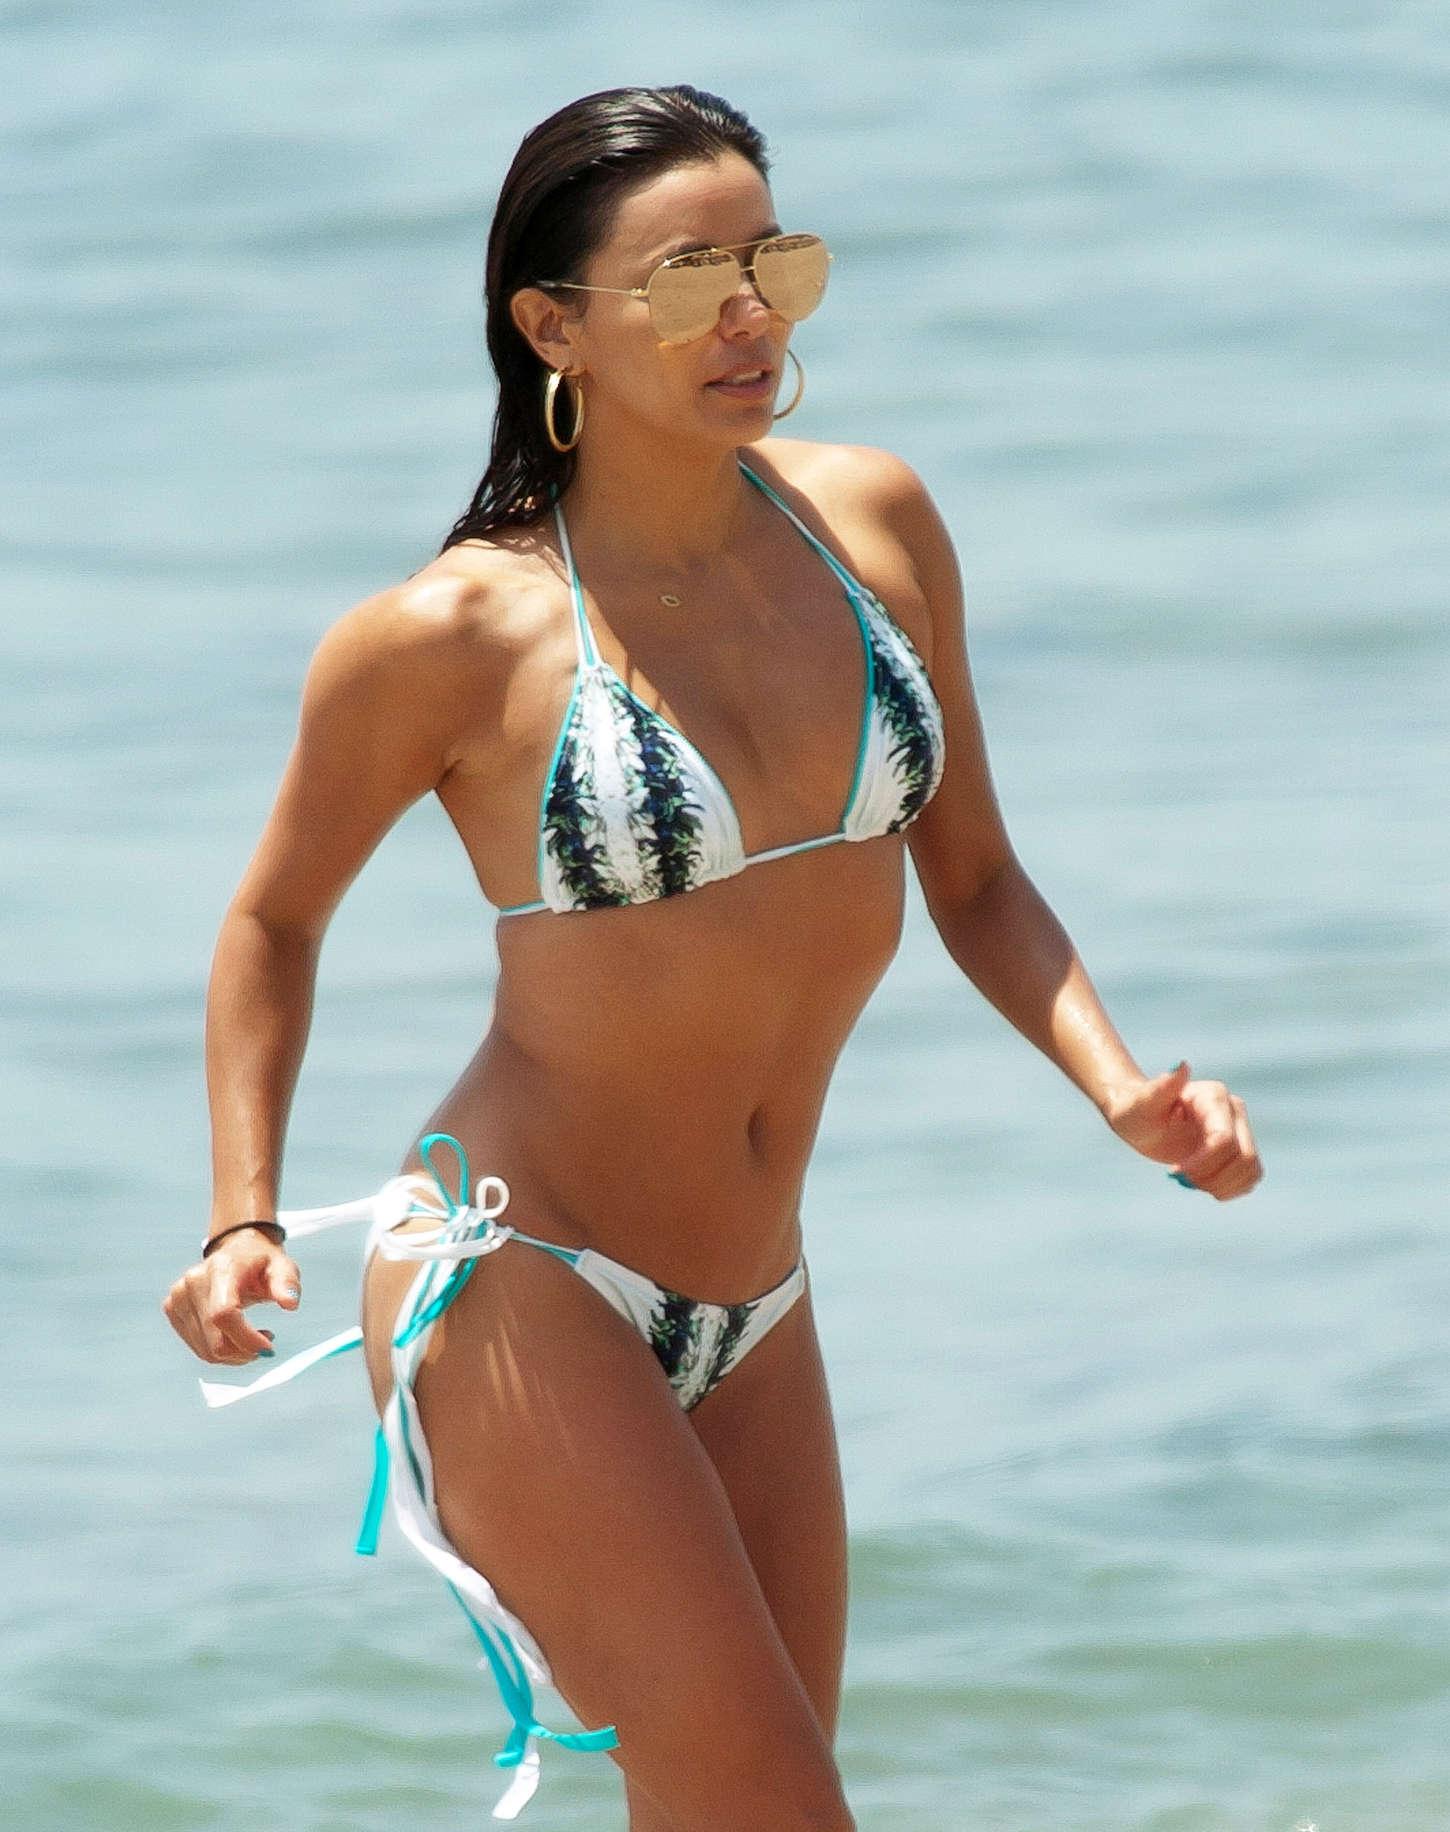 Eva Longoria Bikini Pics